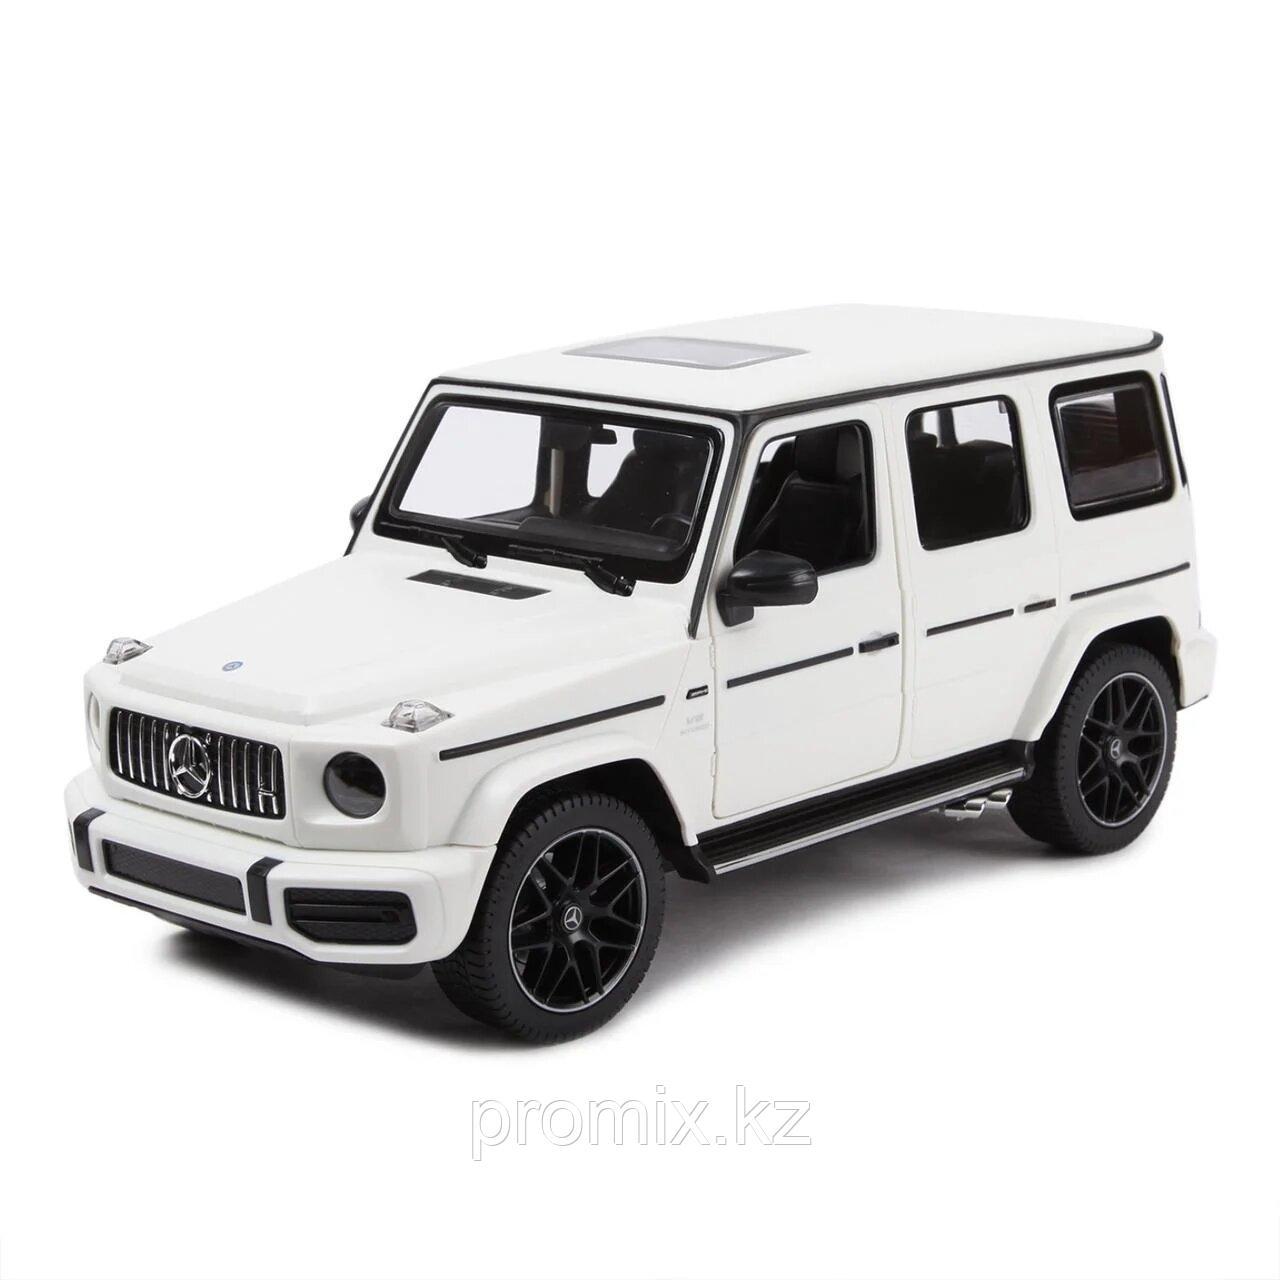 Радиоуправляемая машина Rastar Mercedes-Benz AMG G63, 1:14, White - фото 1